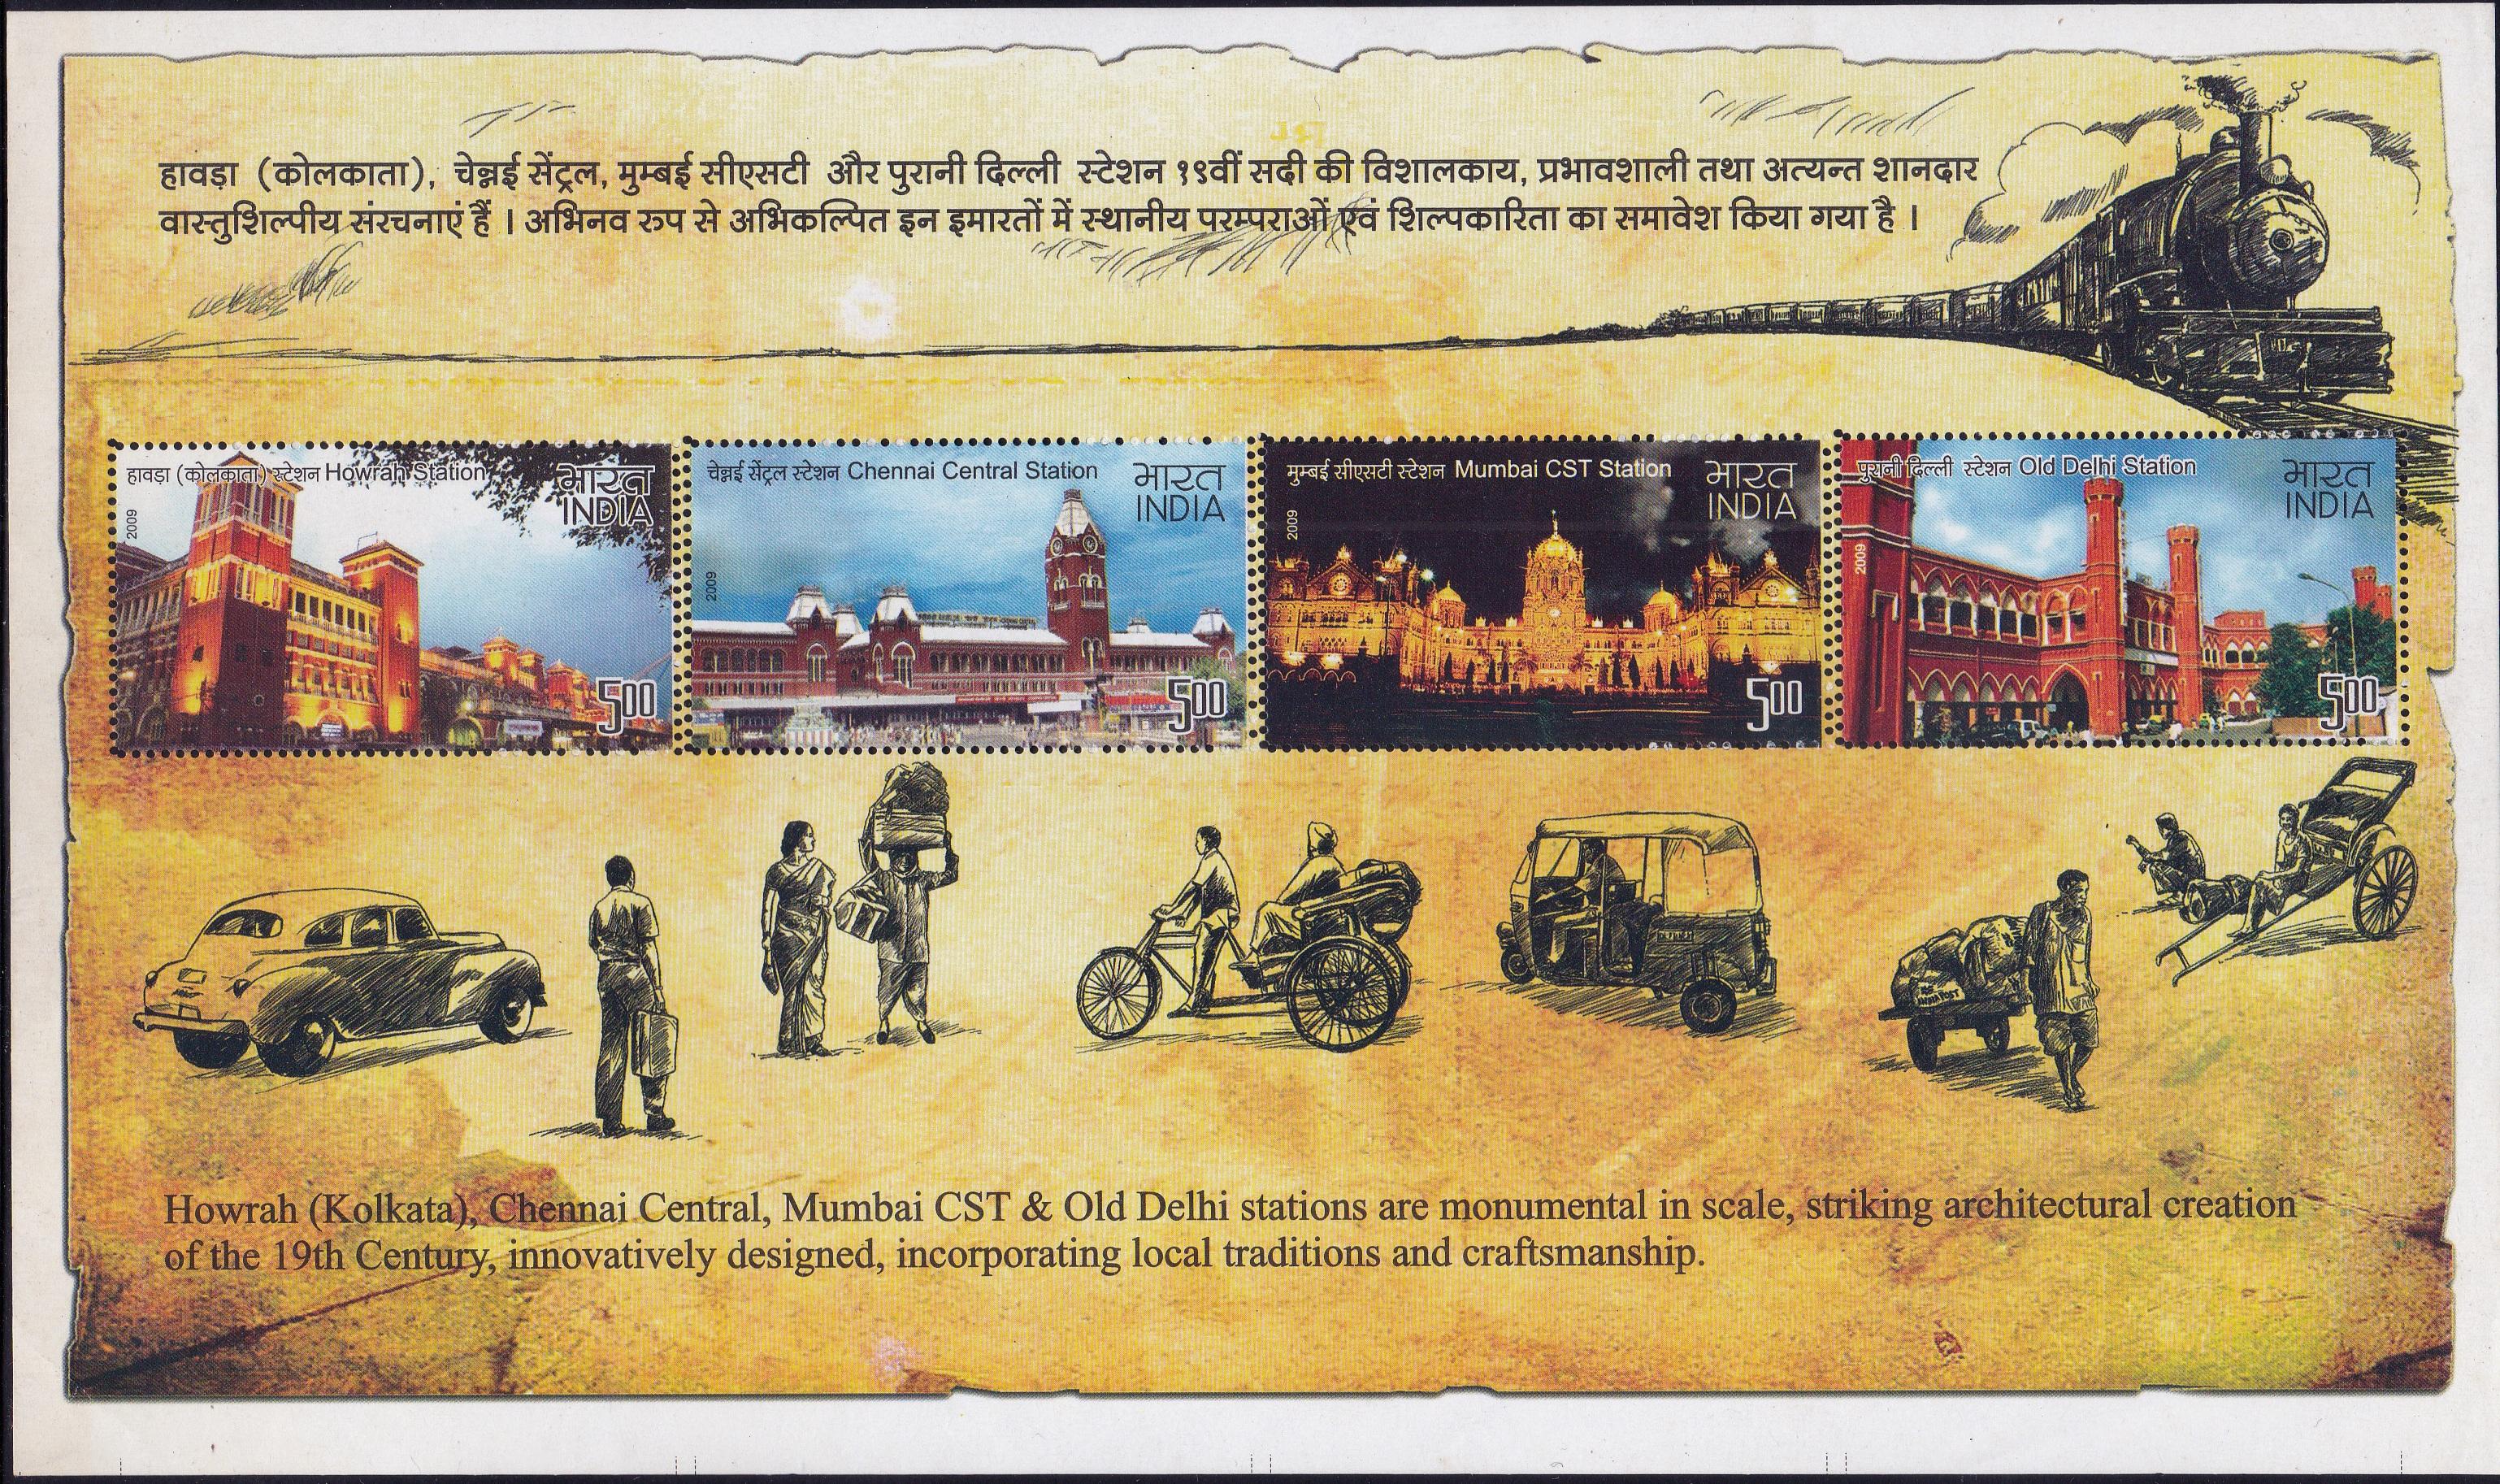 Howrah Junction, Madras Central, Victoria Terminus, Chhatrapati Shivaji Terminus and Delhi Junction